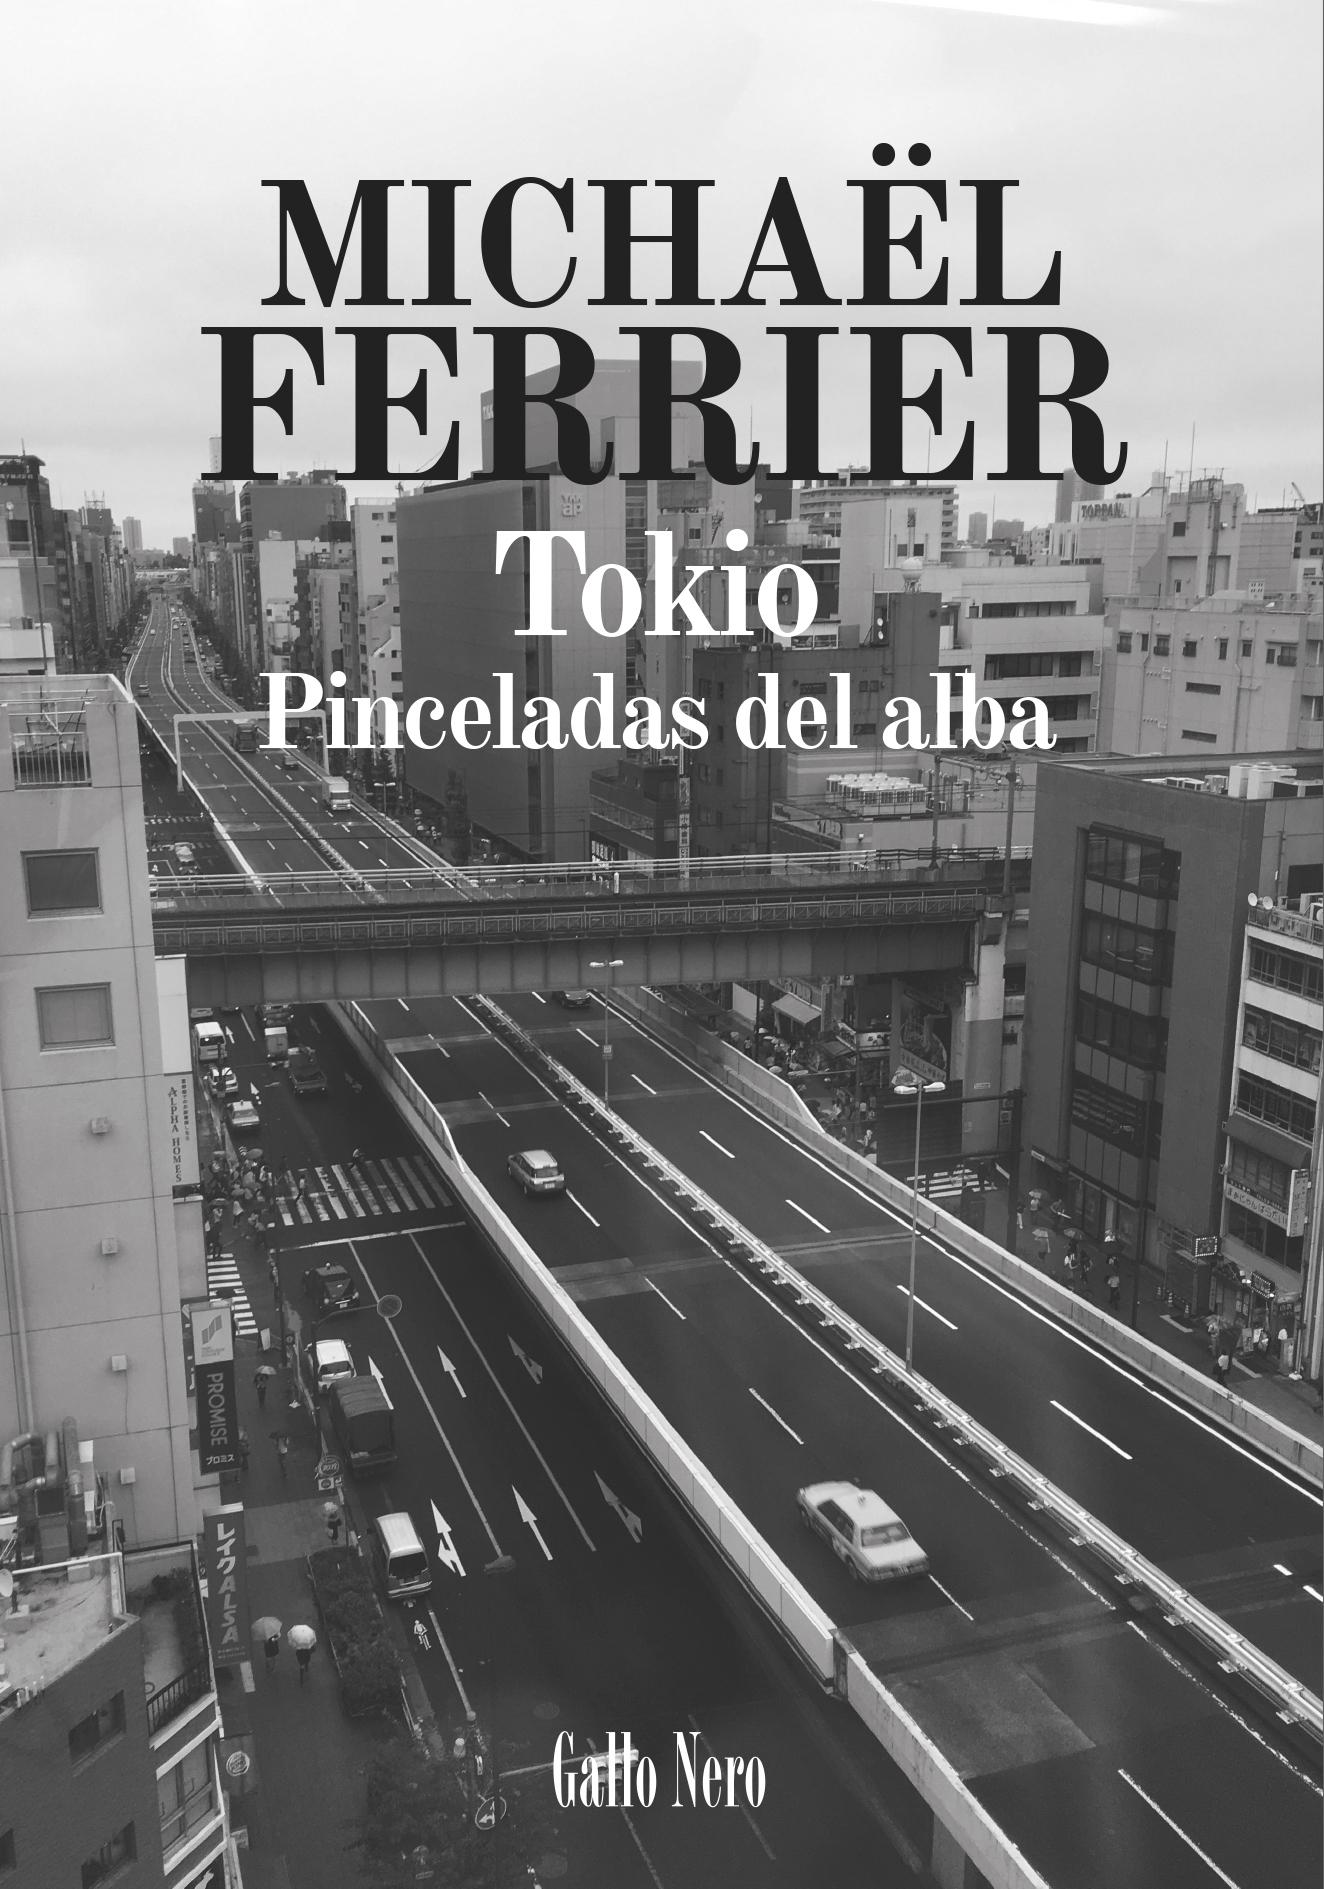 Ferrier, Tokio, Pinceladas del alba